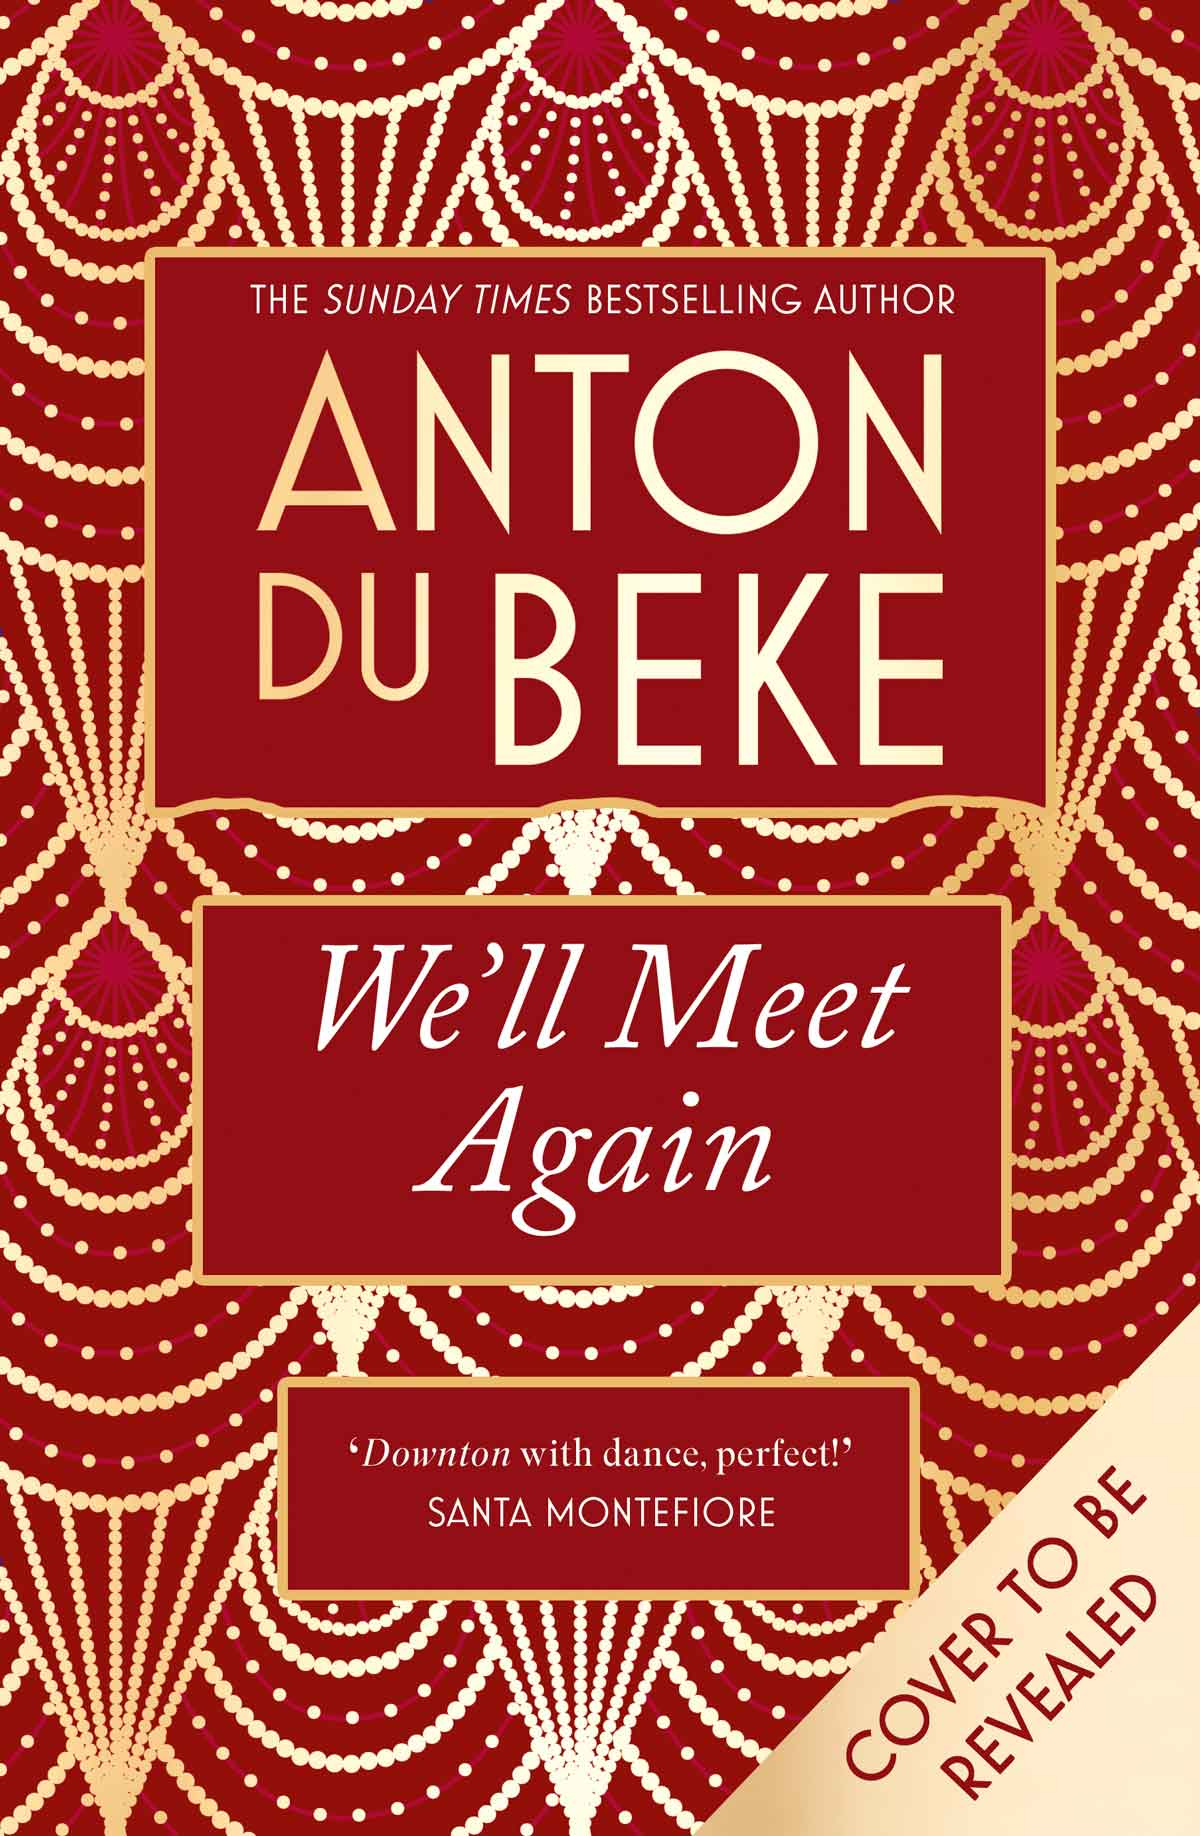 We'll Meet Again - the 4th Novel from Anton Du Beke - pre-order now!